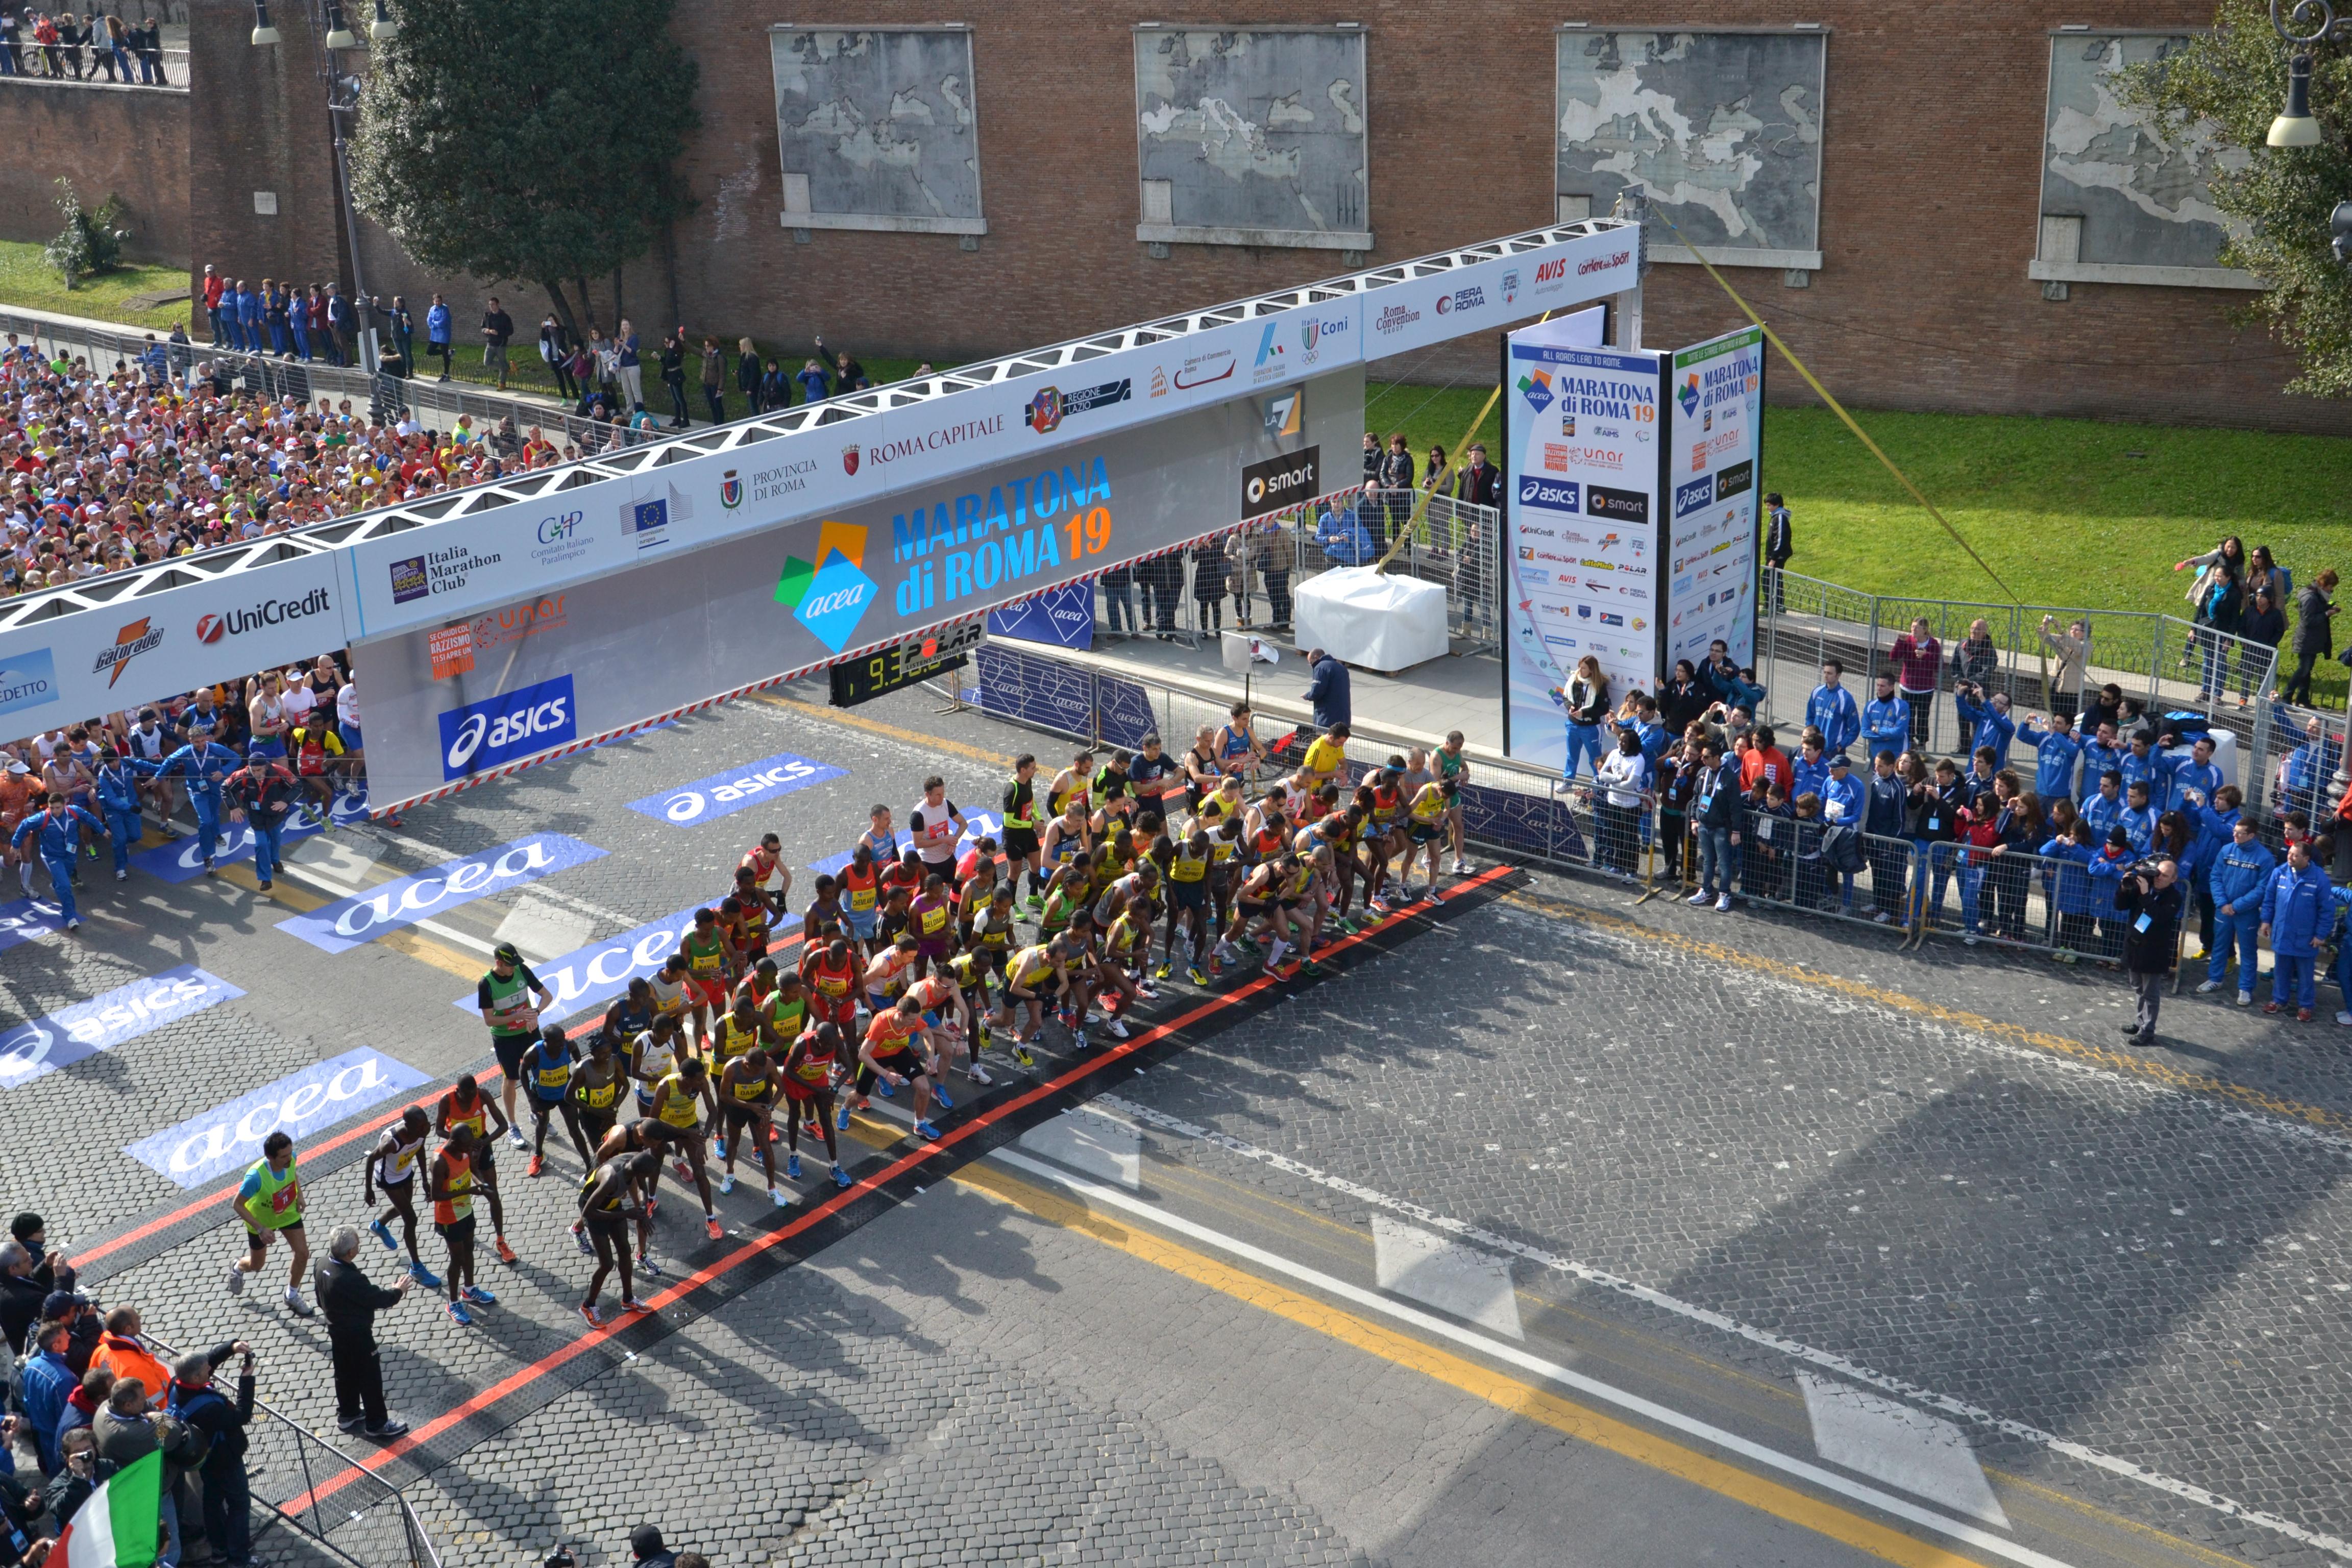 maratona-di-roma-2013-194